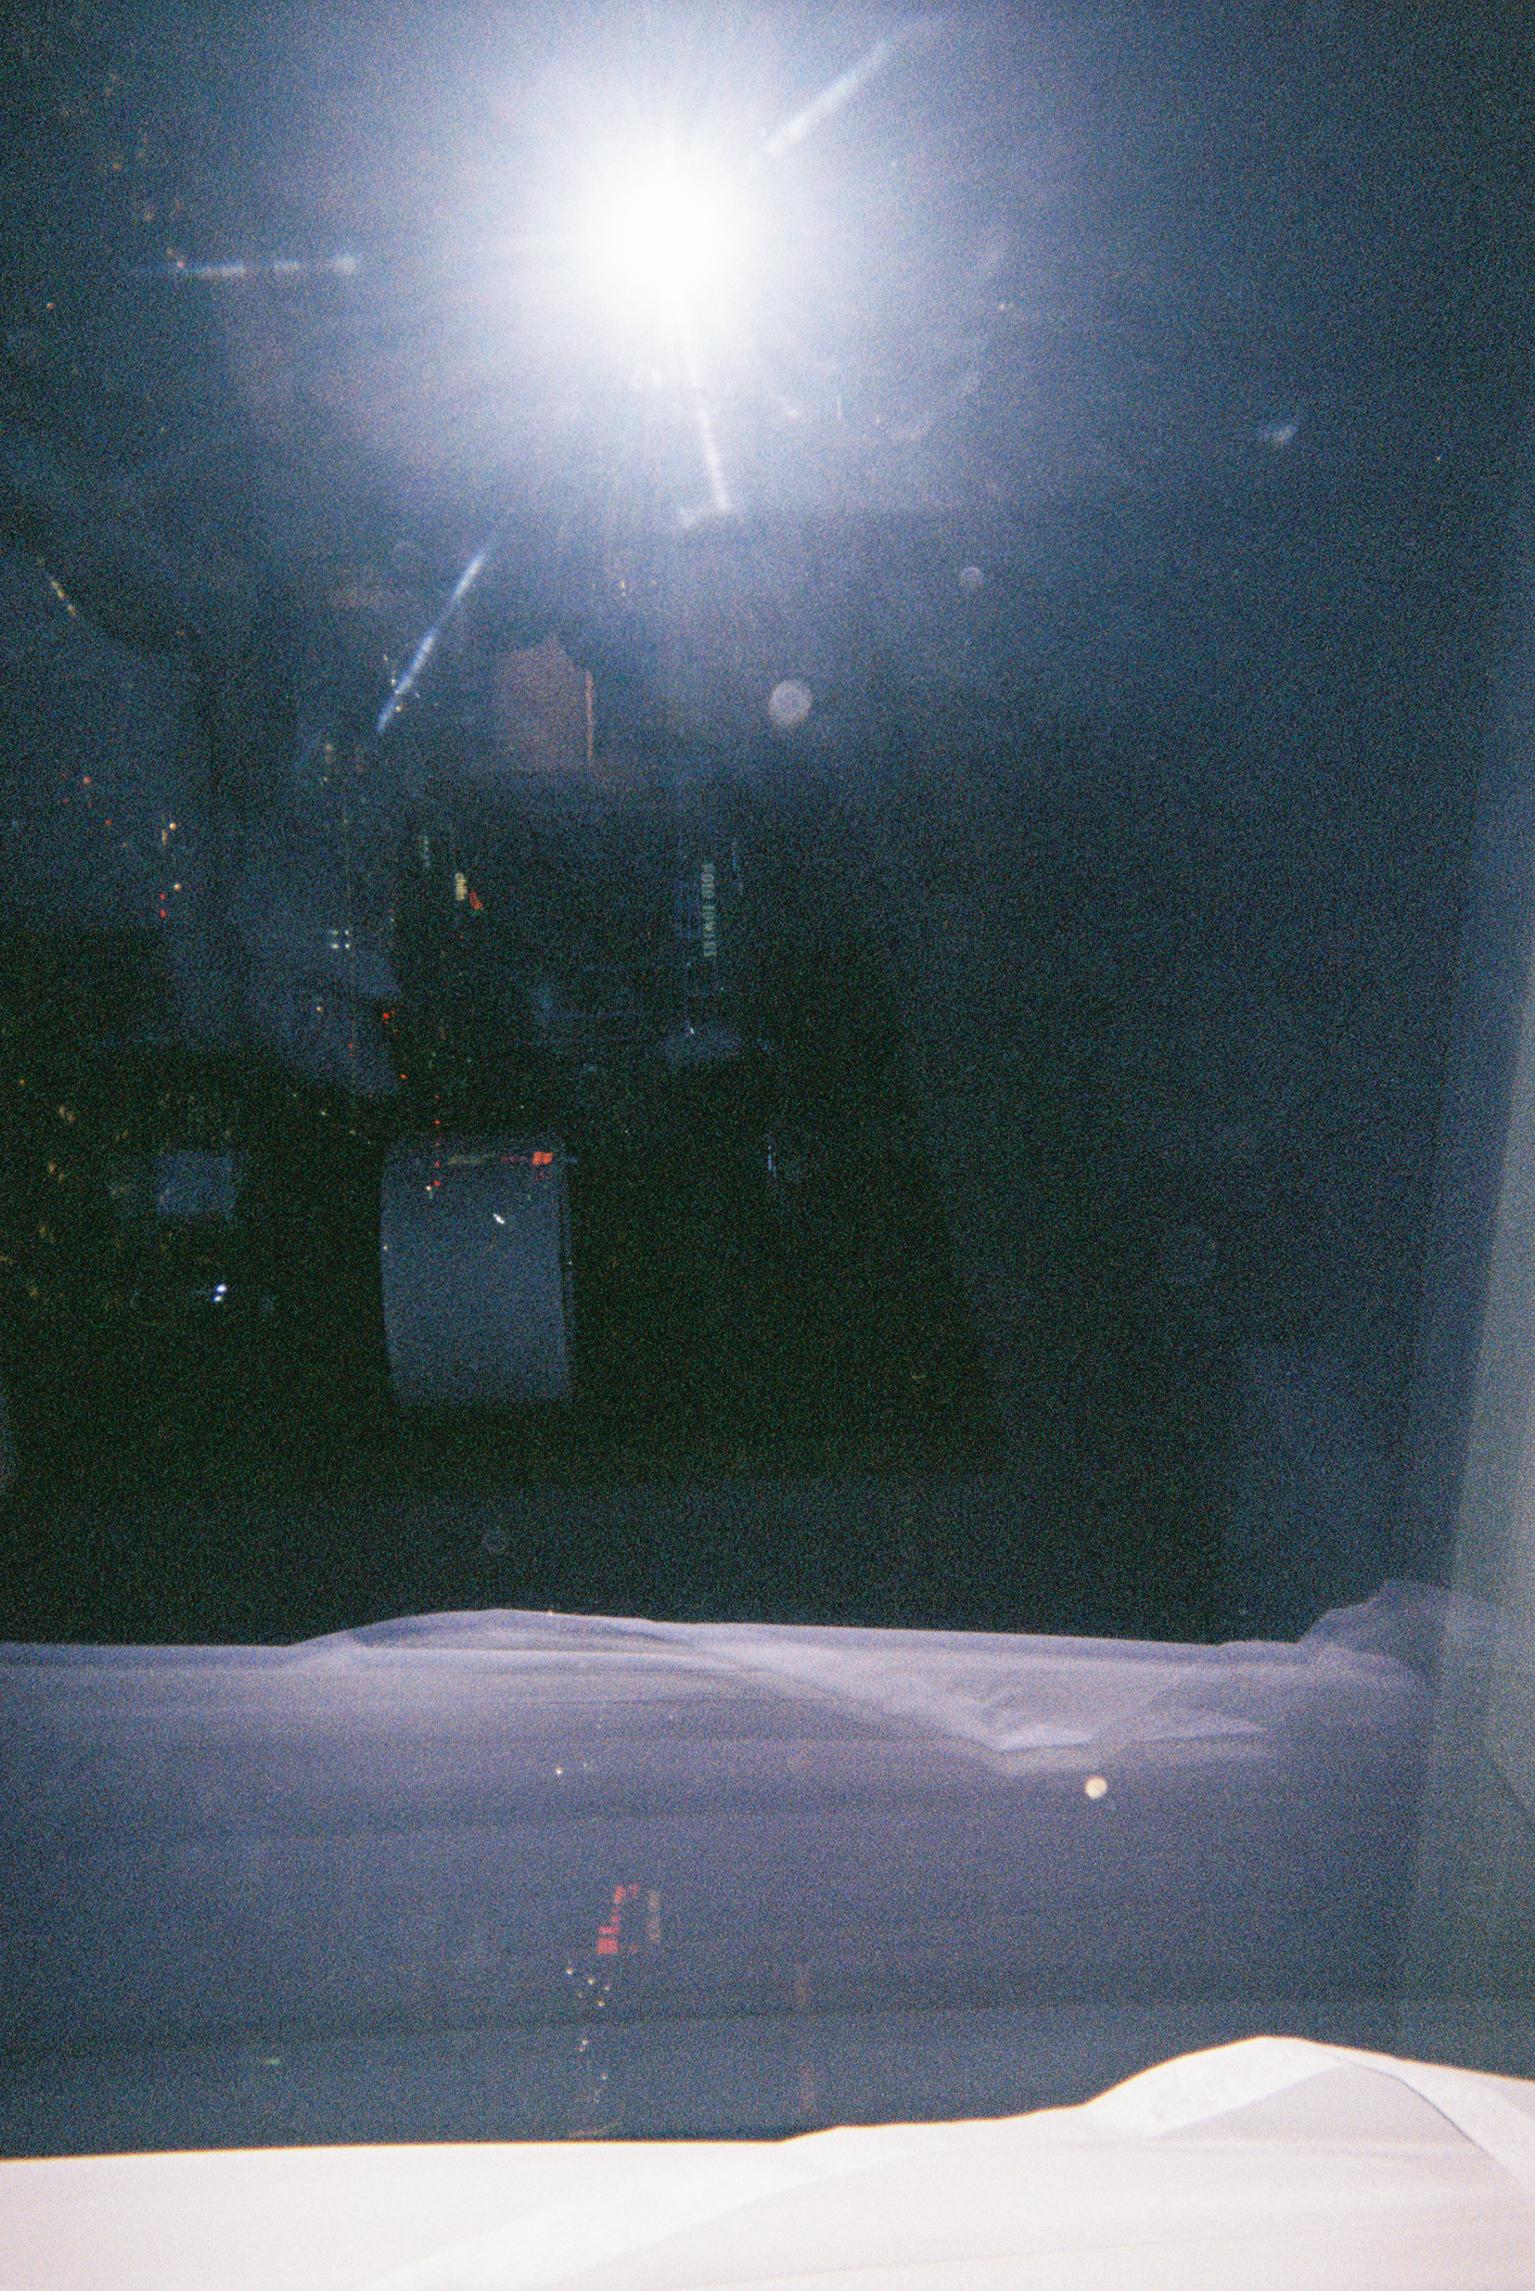 chris91-076.jpg